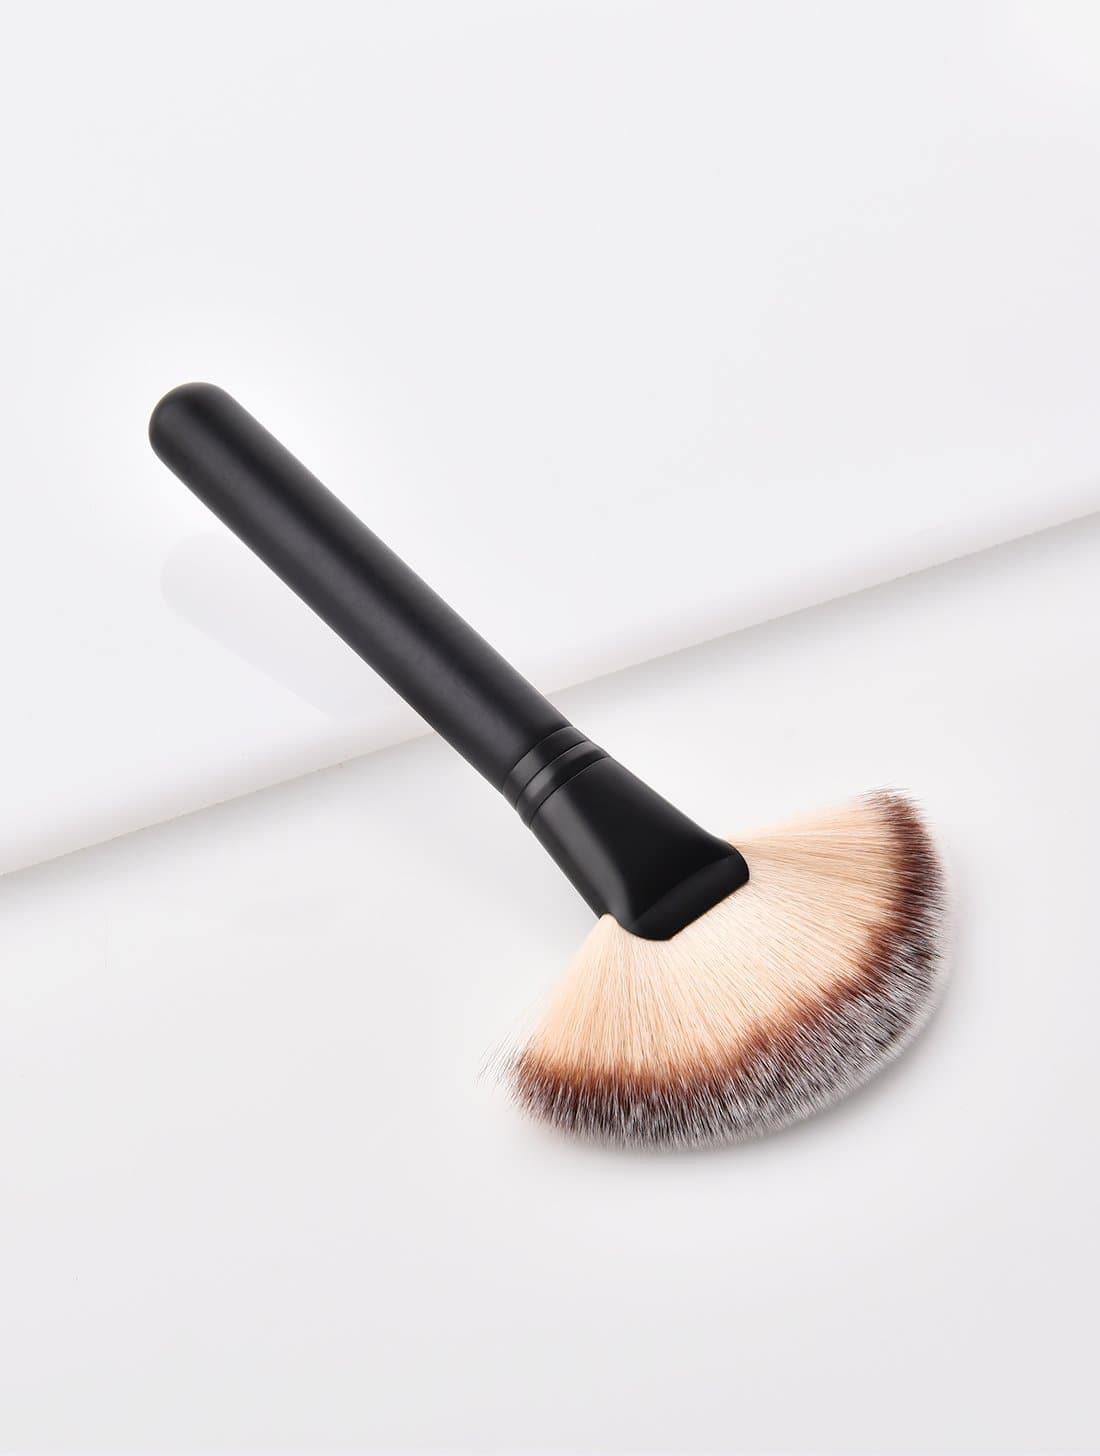 Fan Shaped Makeup Brush 1pc